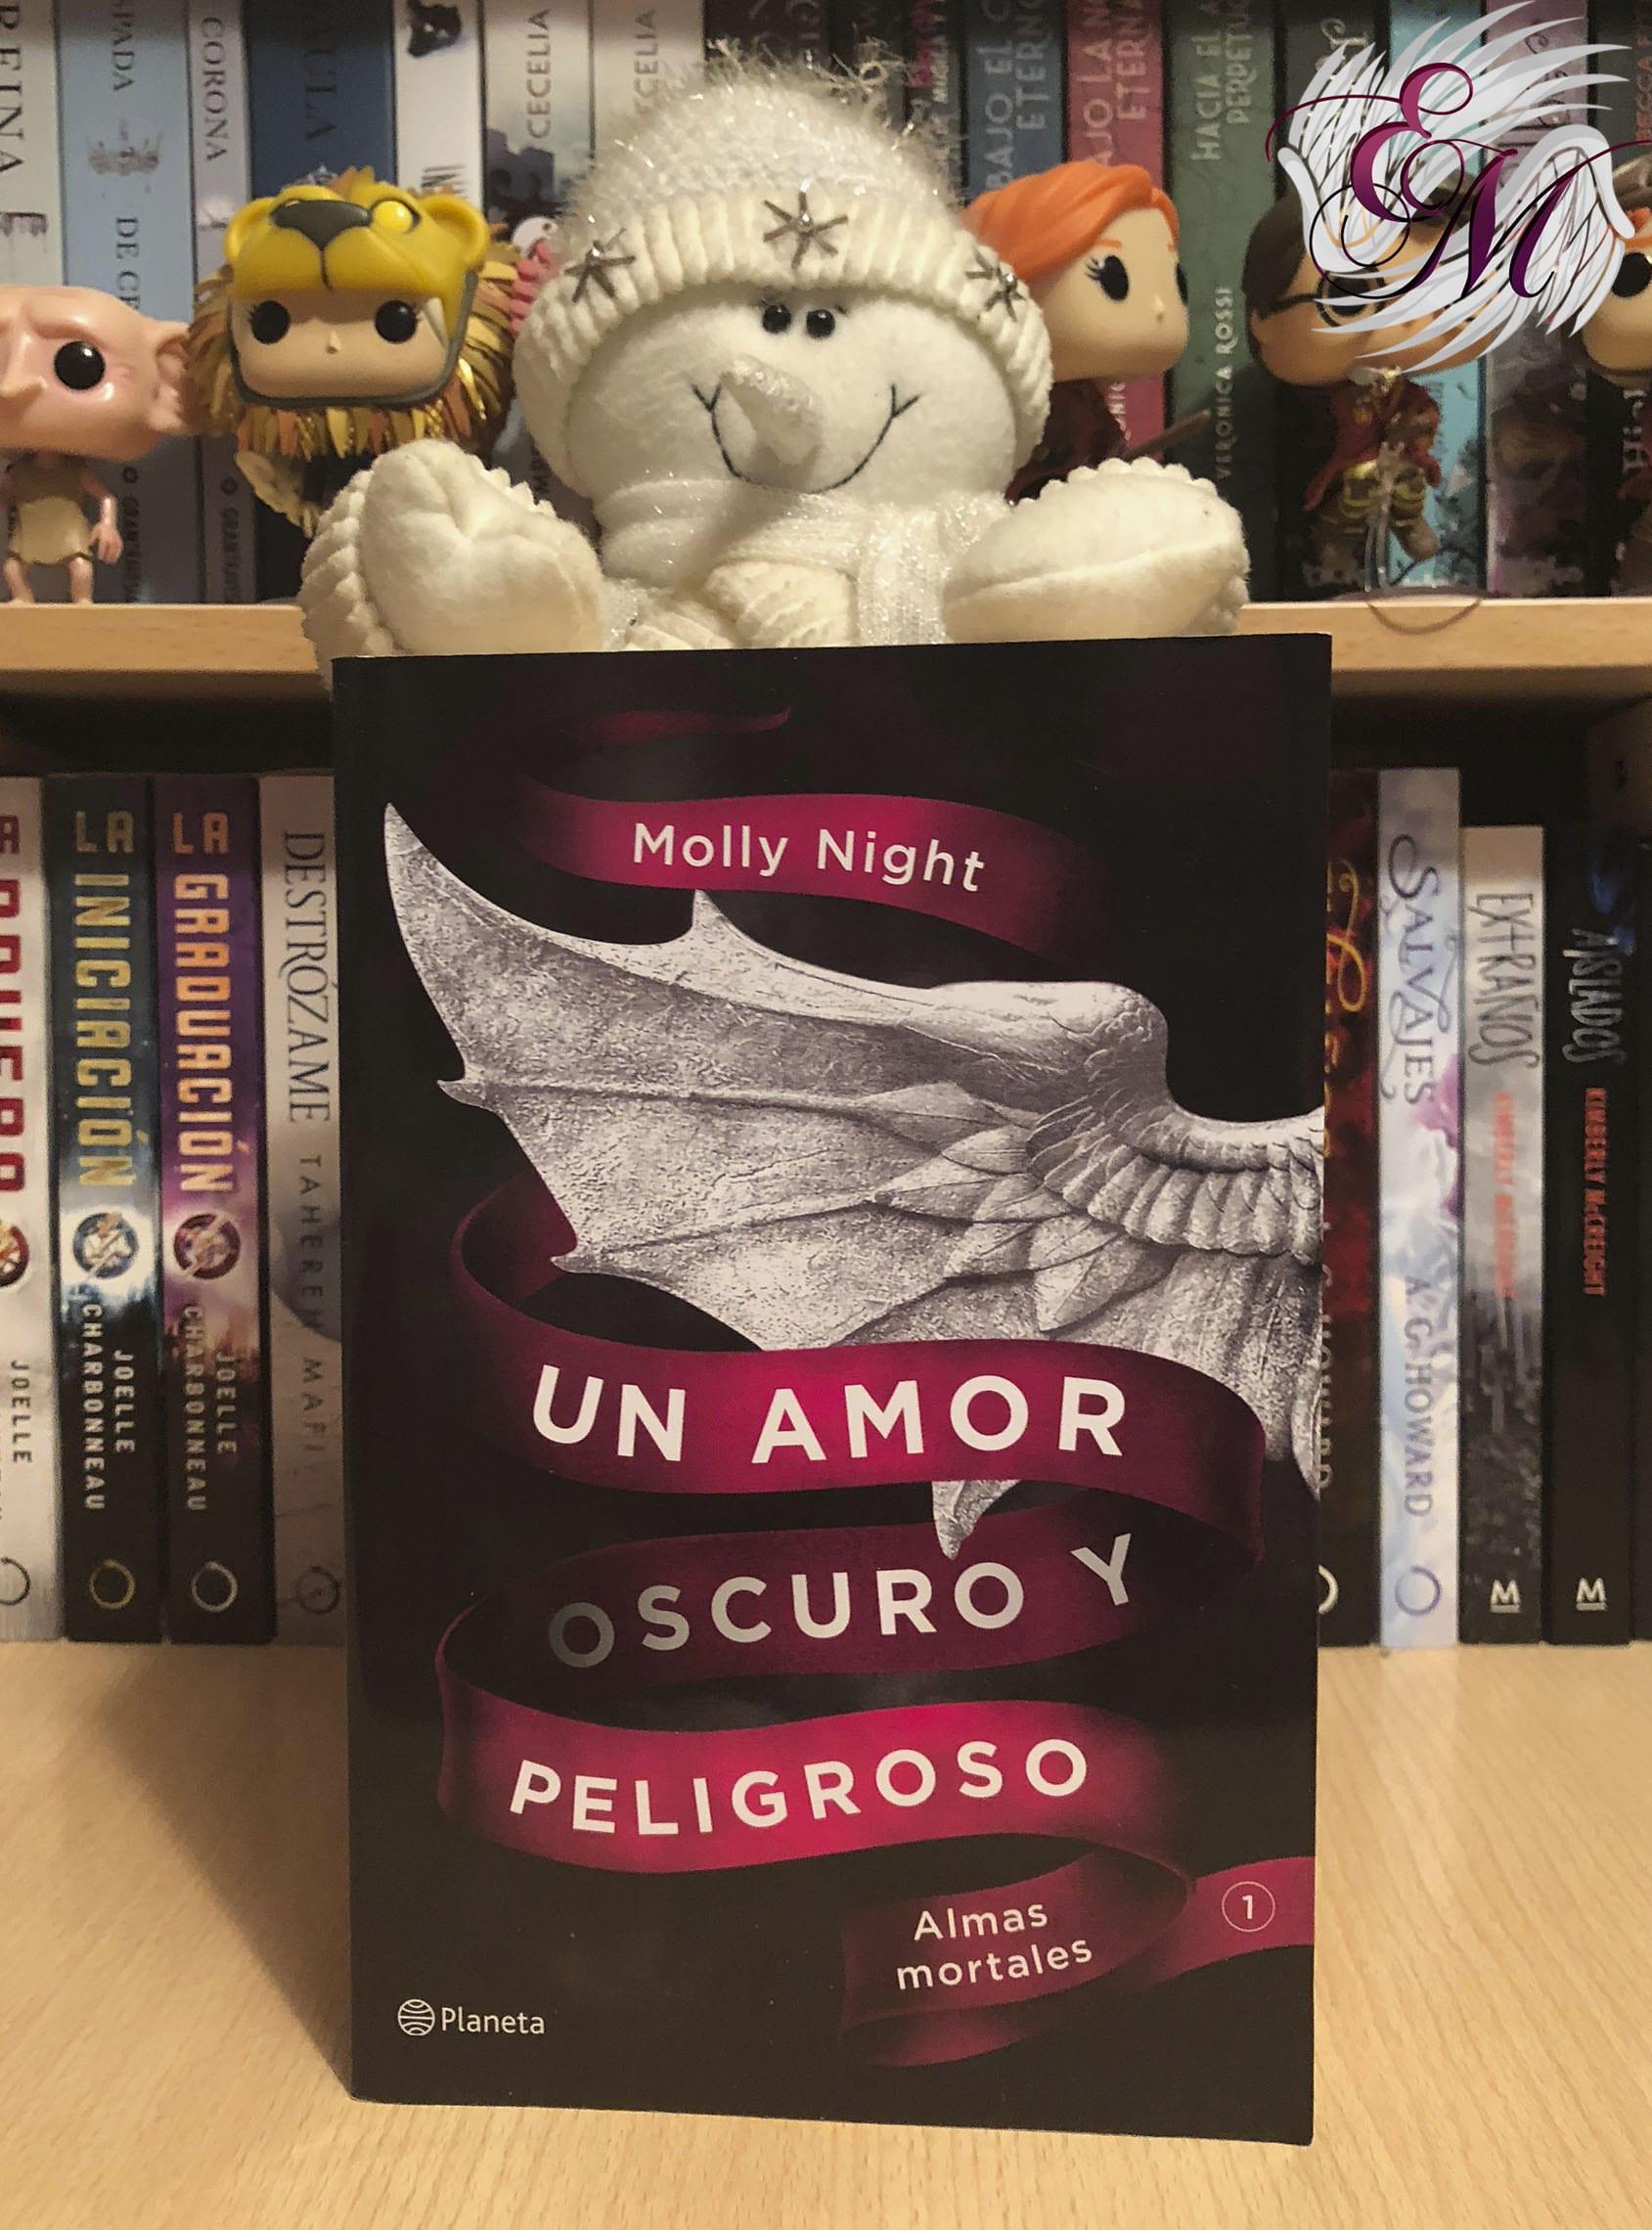 Un amor oscuro y peligroso, de Molly Night - Reseña